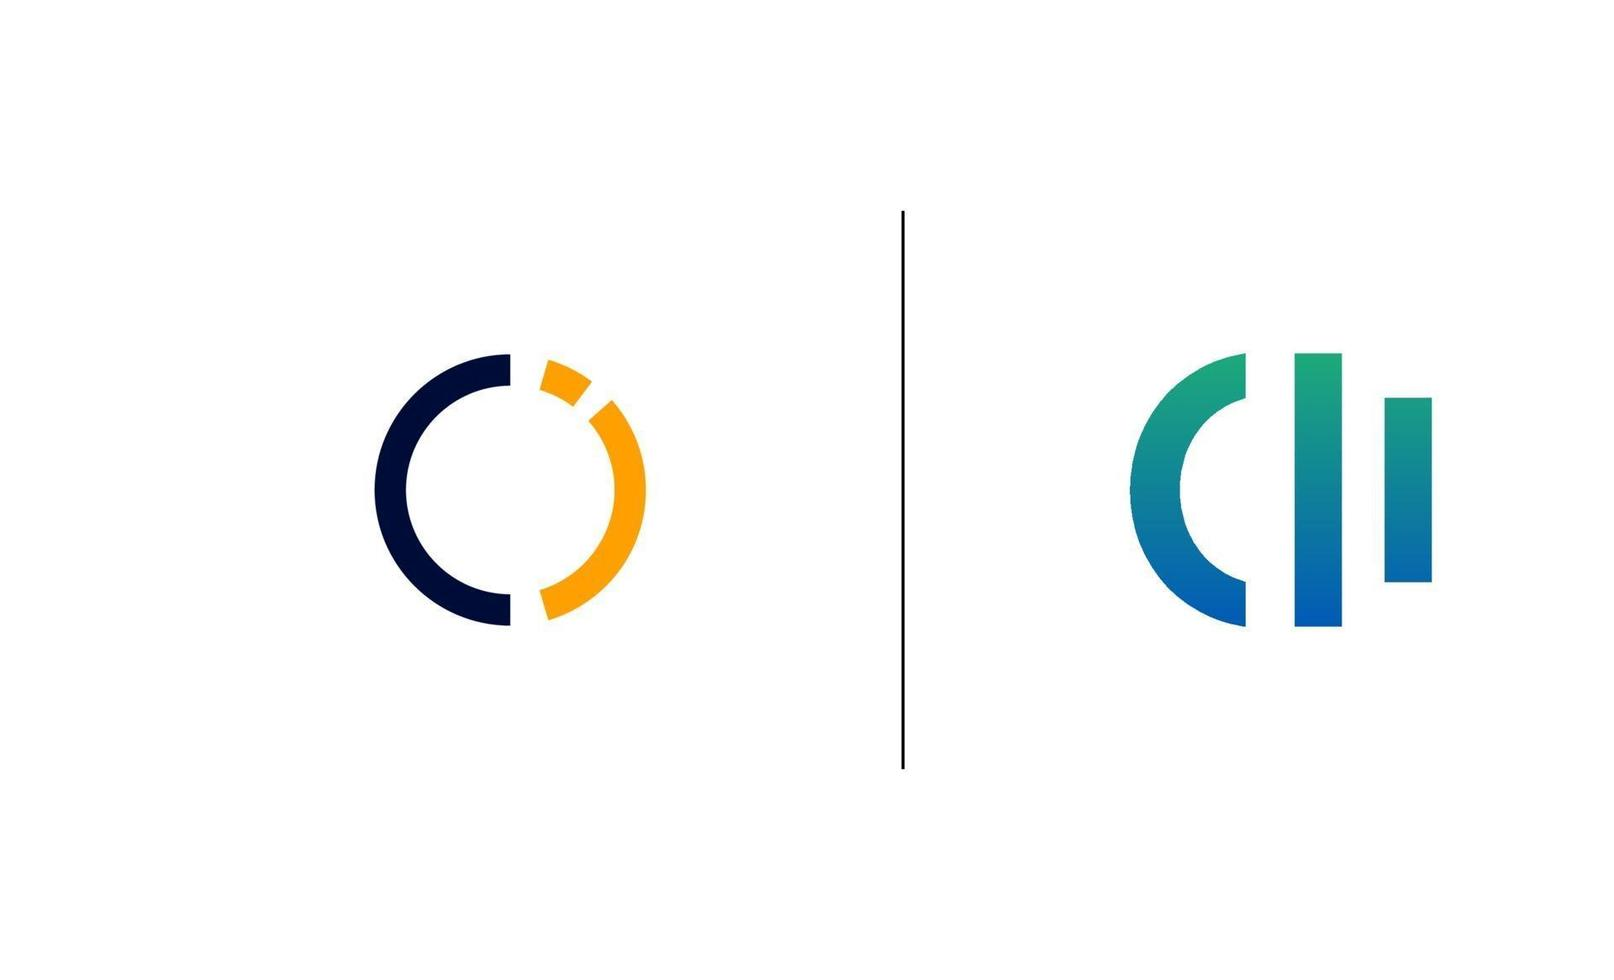 ci iniziale, ic logo design template vector